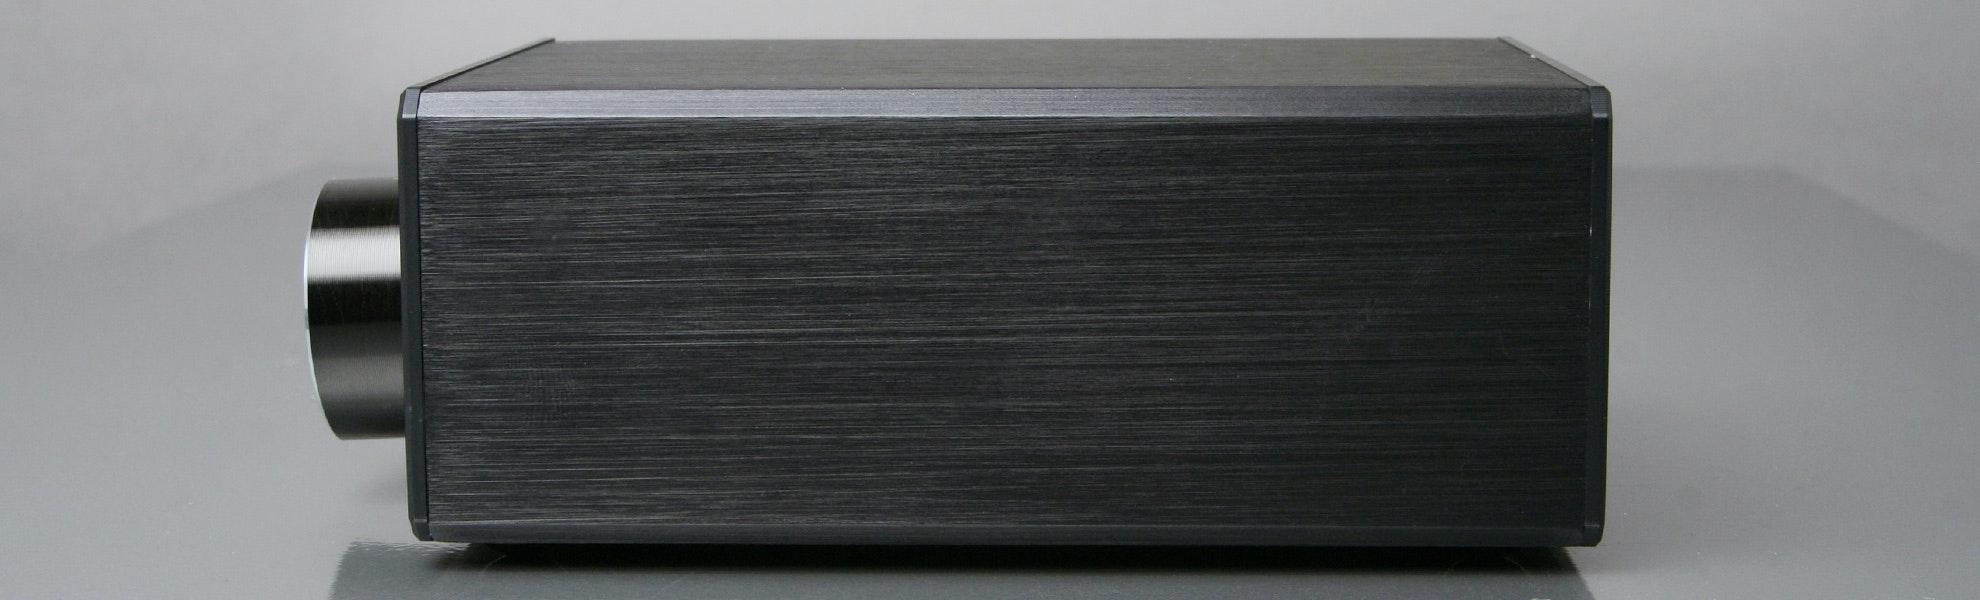 Monoprice Desktop Amp / DAC